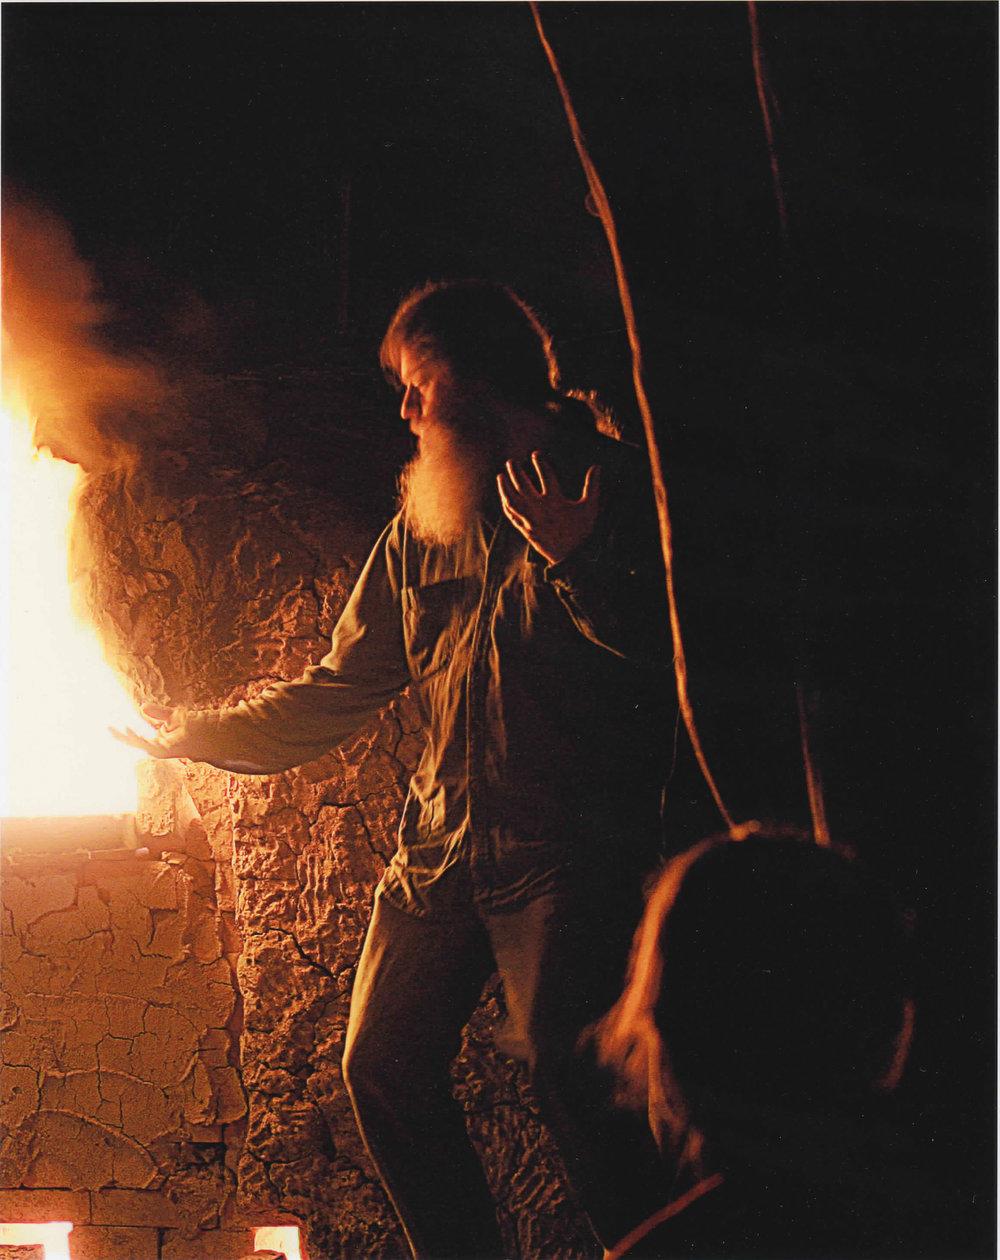 Gordon Hutchens在窯洞里燒製陶器。Photo by Jan Florian